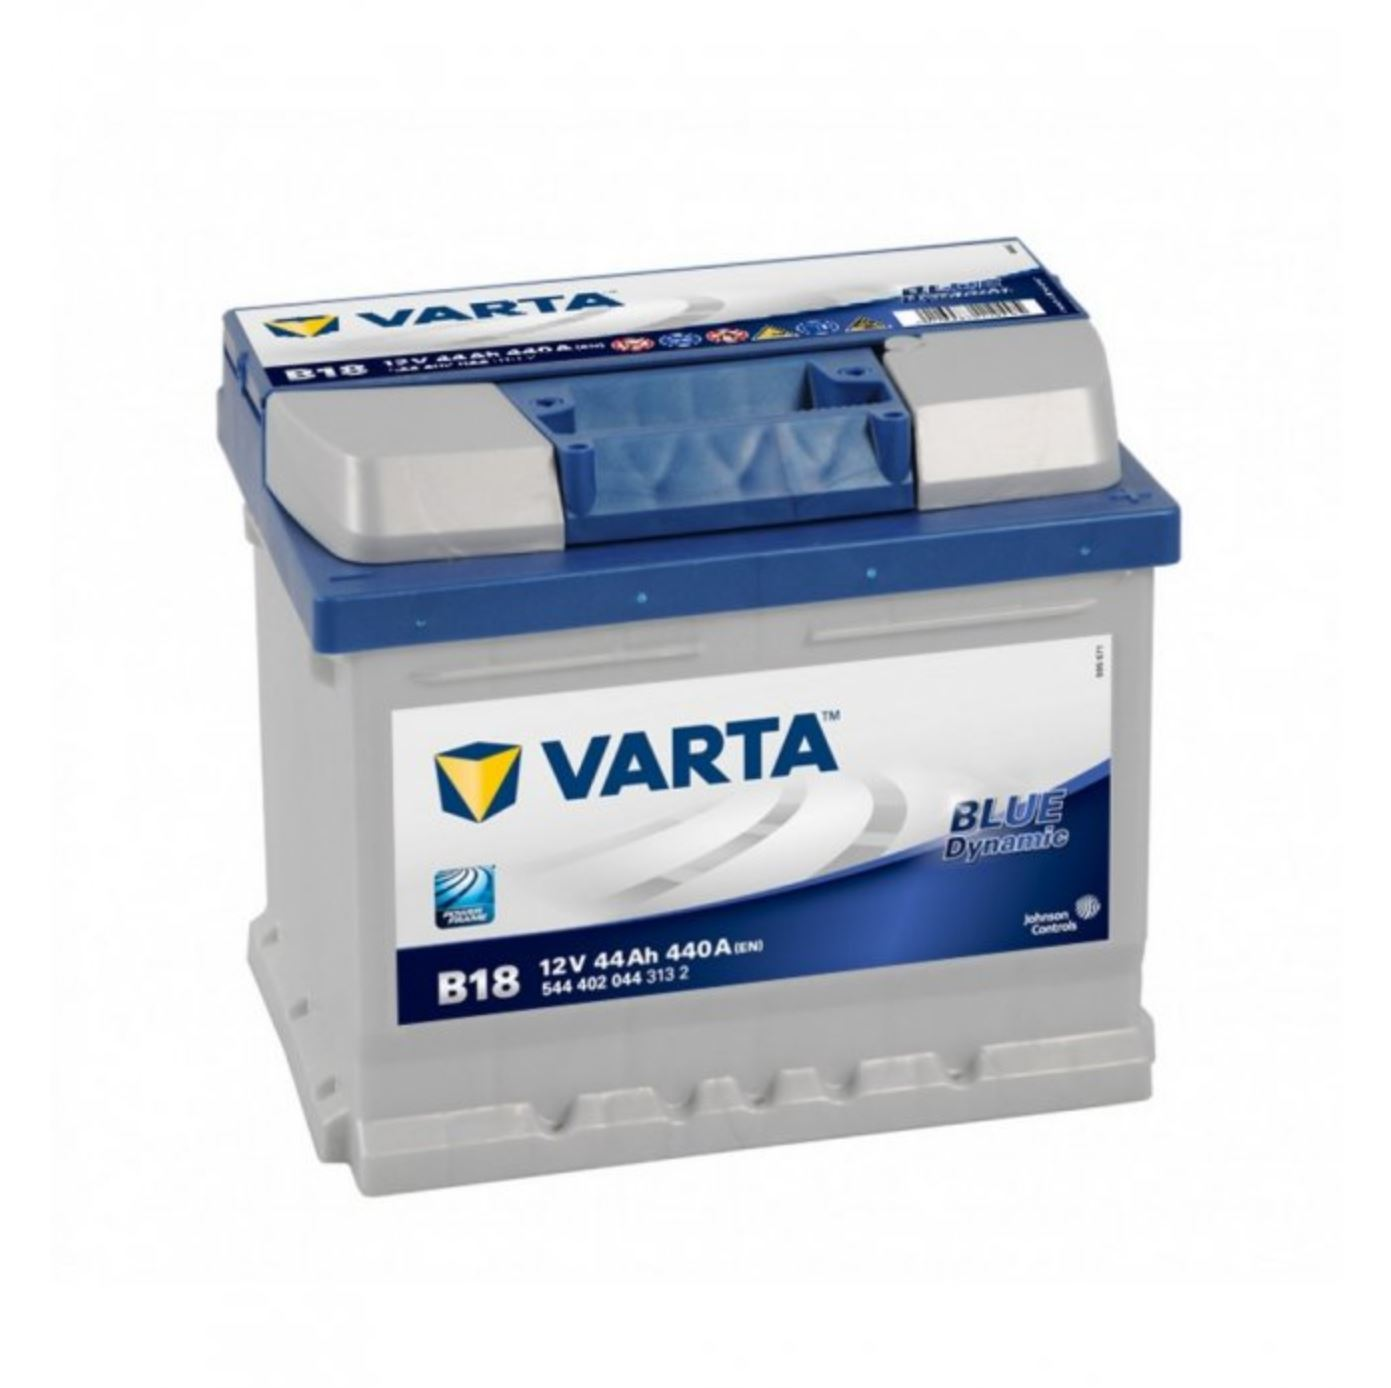 Varta Blue Dynamic 12V 44Ah 440A 544 402 044